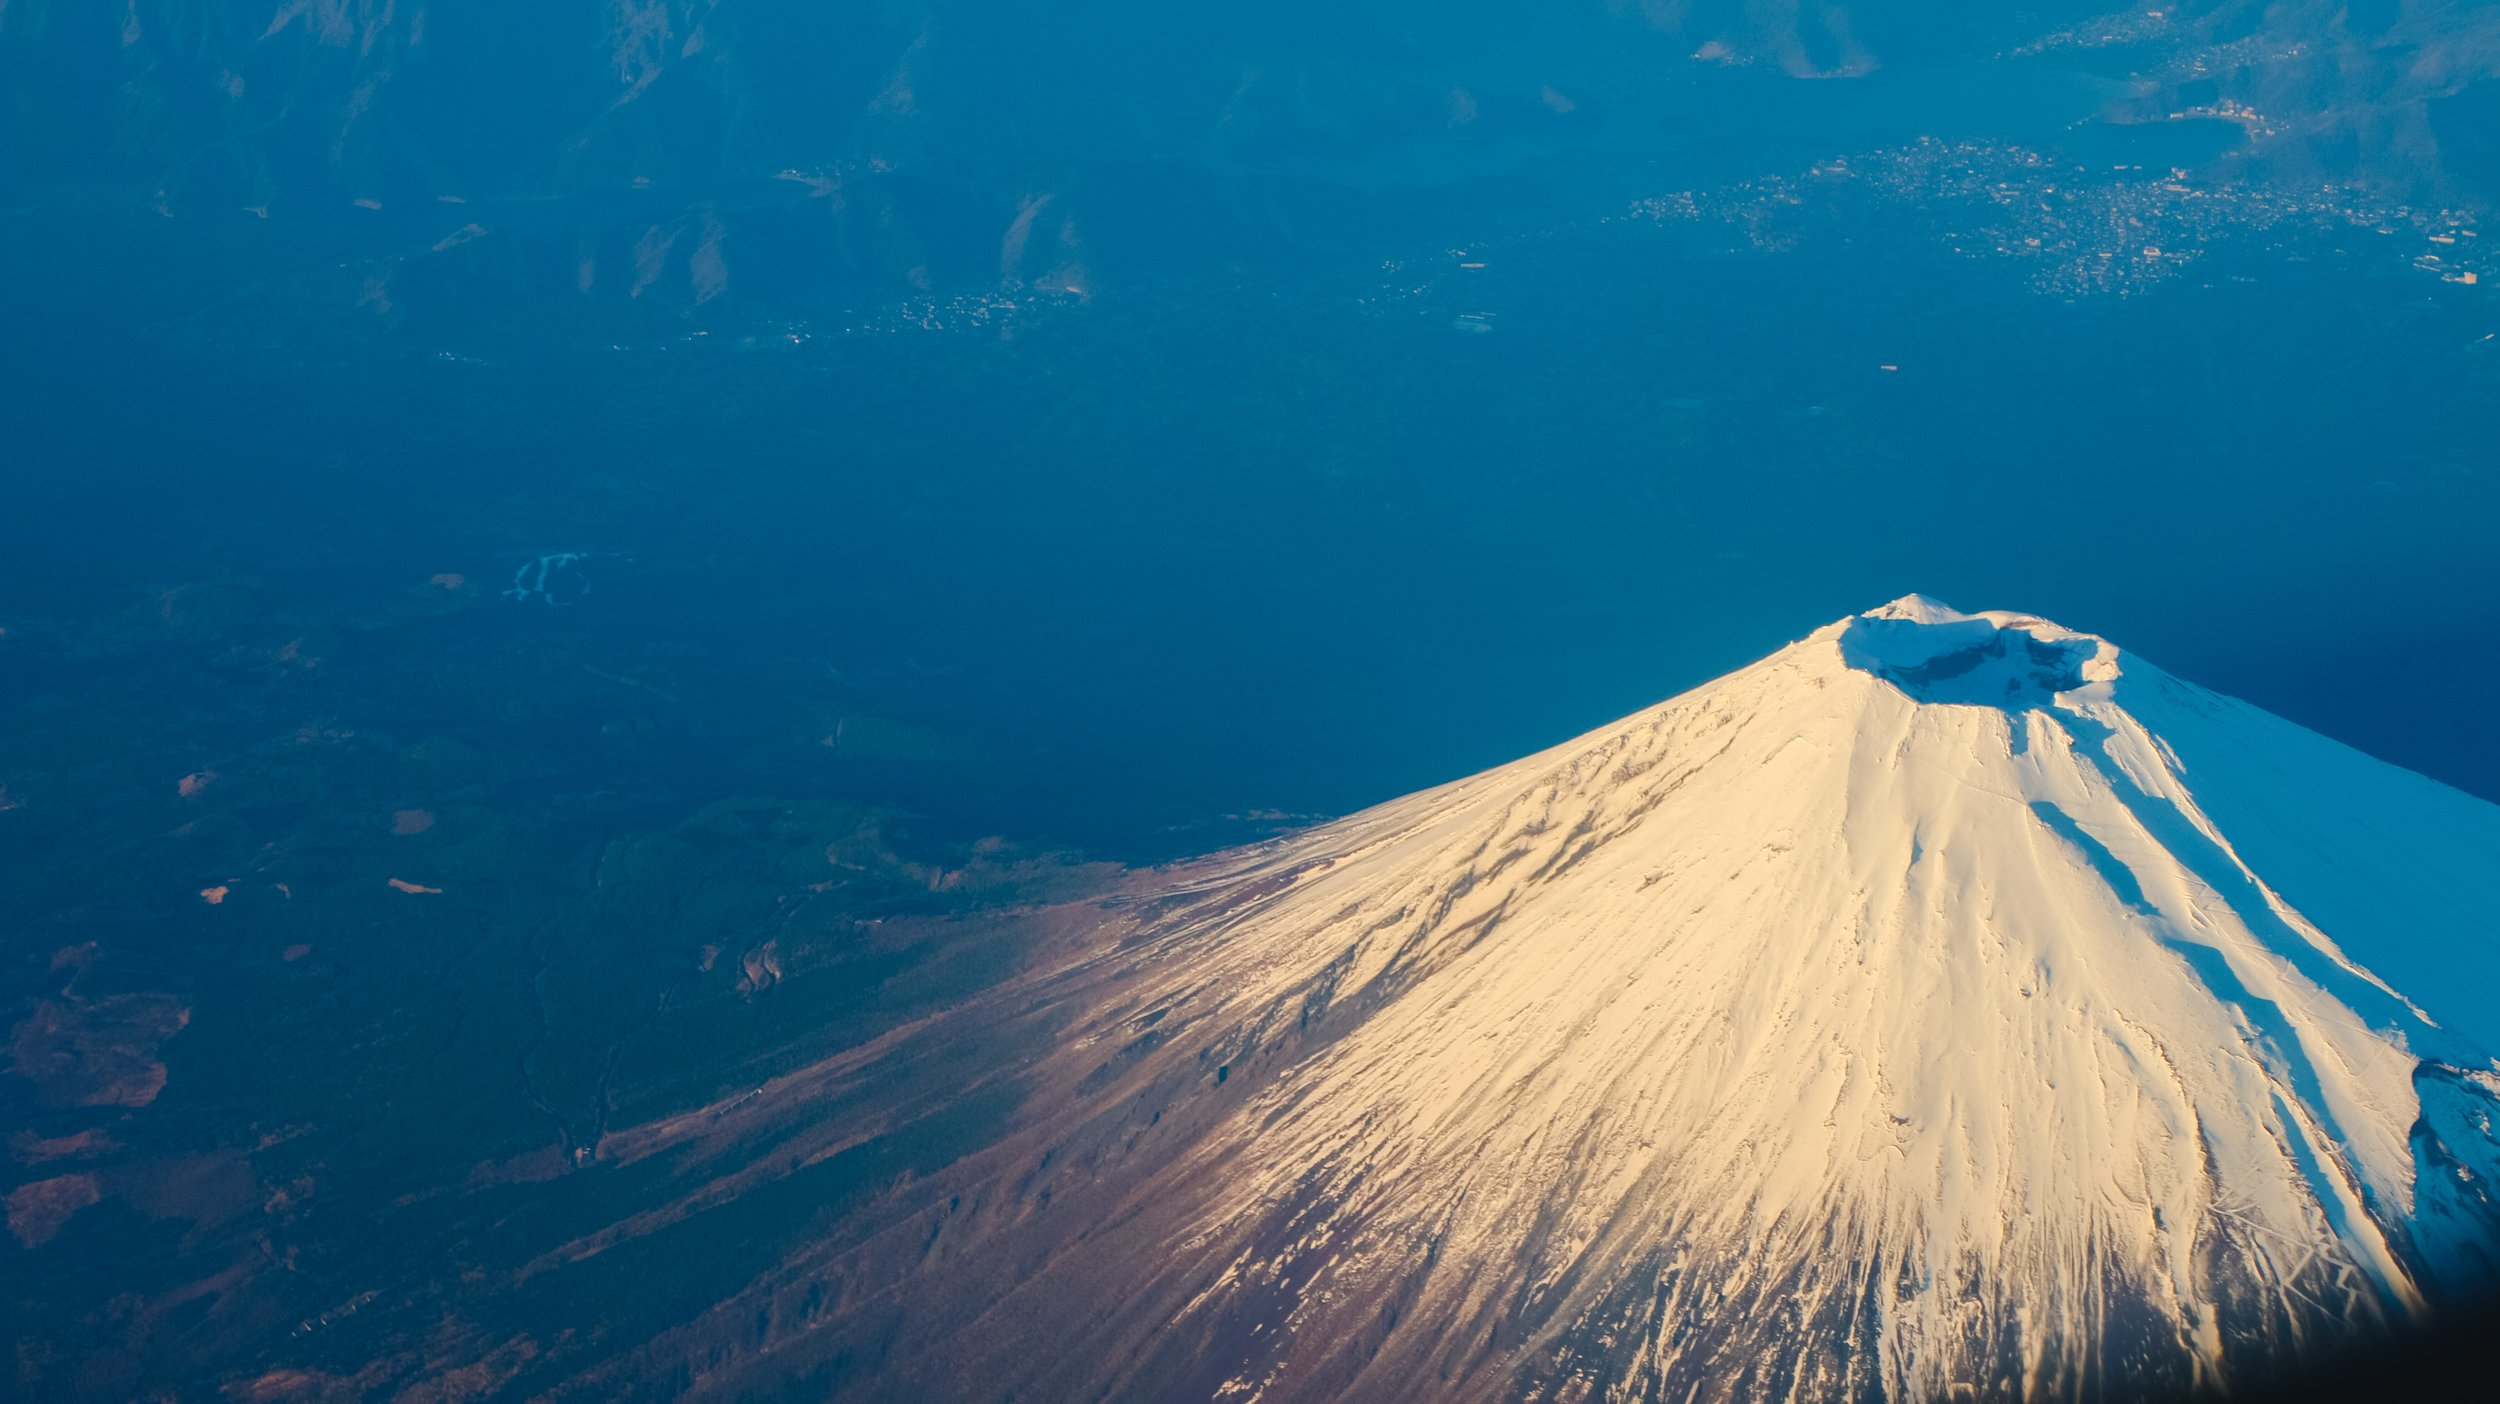 adventure-asia-beautiful-347145 (1).jpg